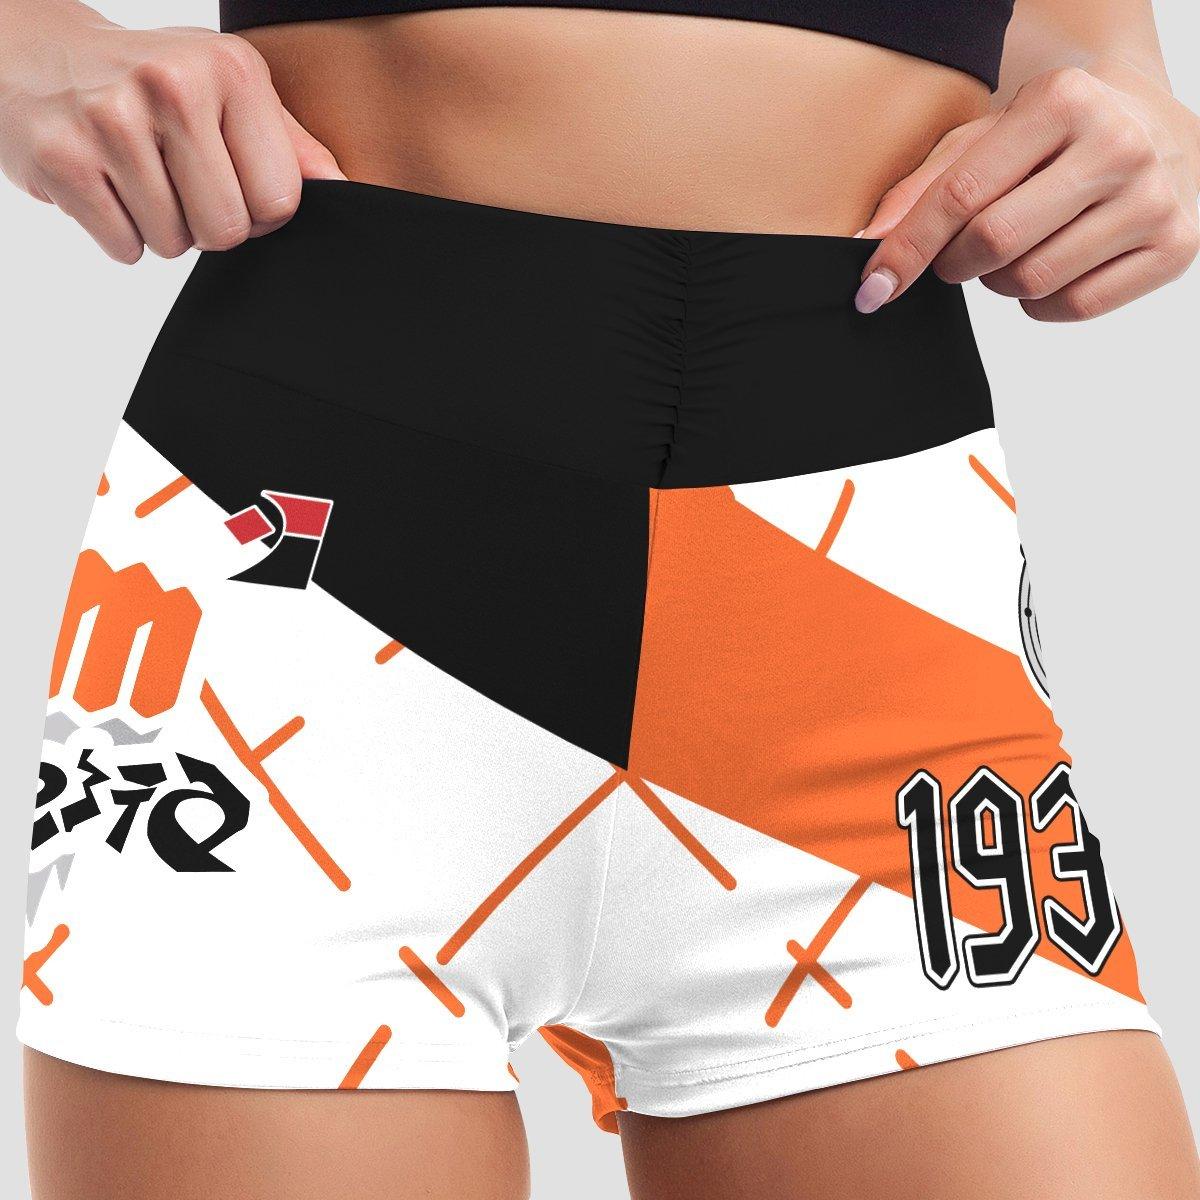 pokemon fighting uniform active wear set 625342 - Anime Swimsuits